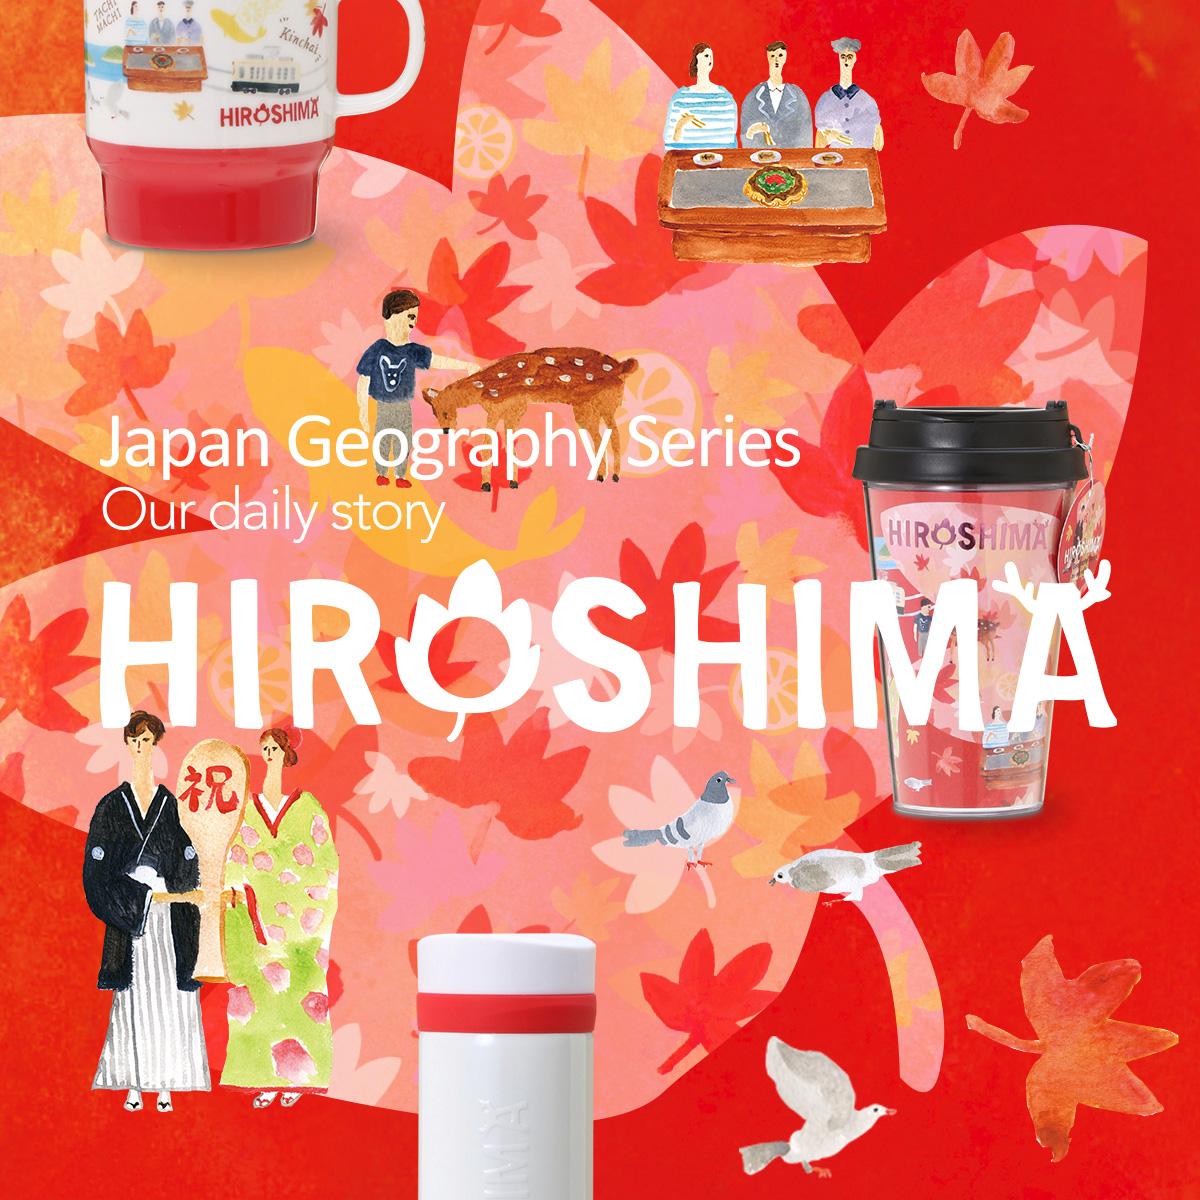 Japan Geography Series 広島